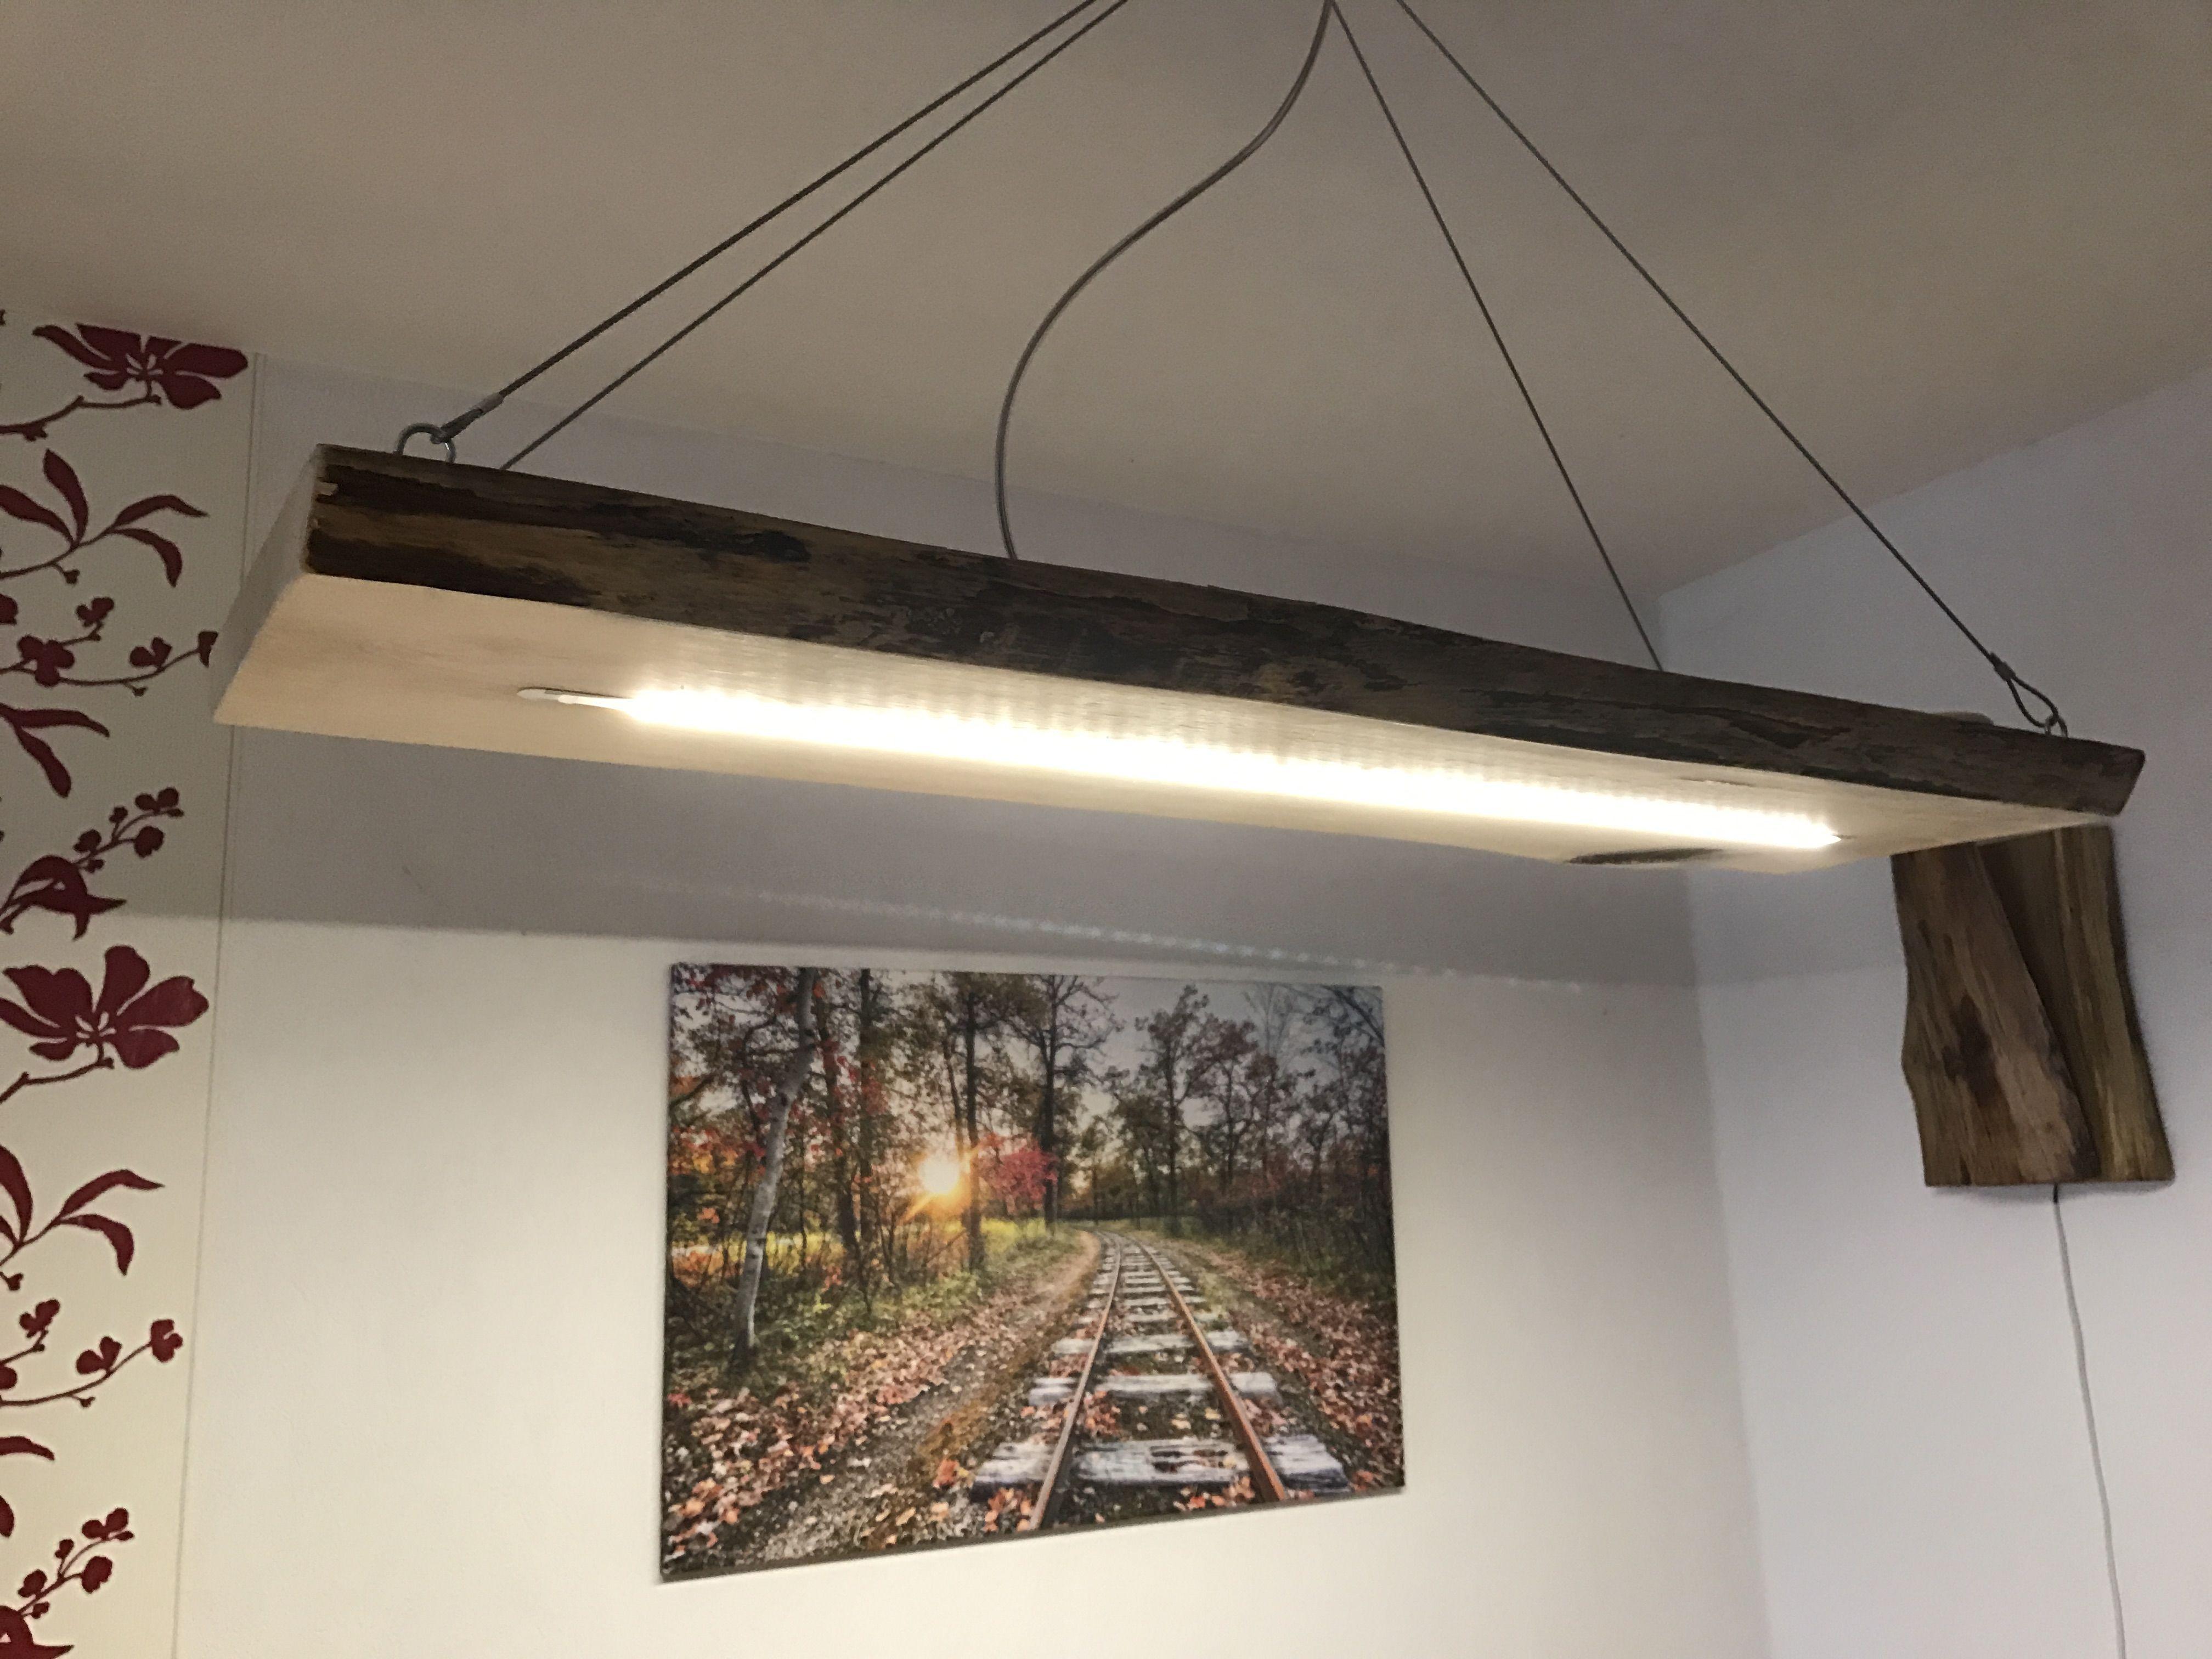 Küchenlampen Hängend ~ Pin von blockholz schmiede auf led holz lampen natur rustikal